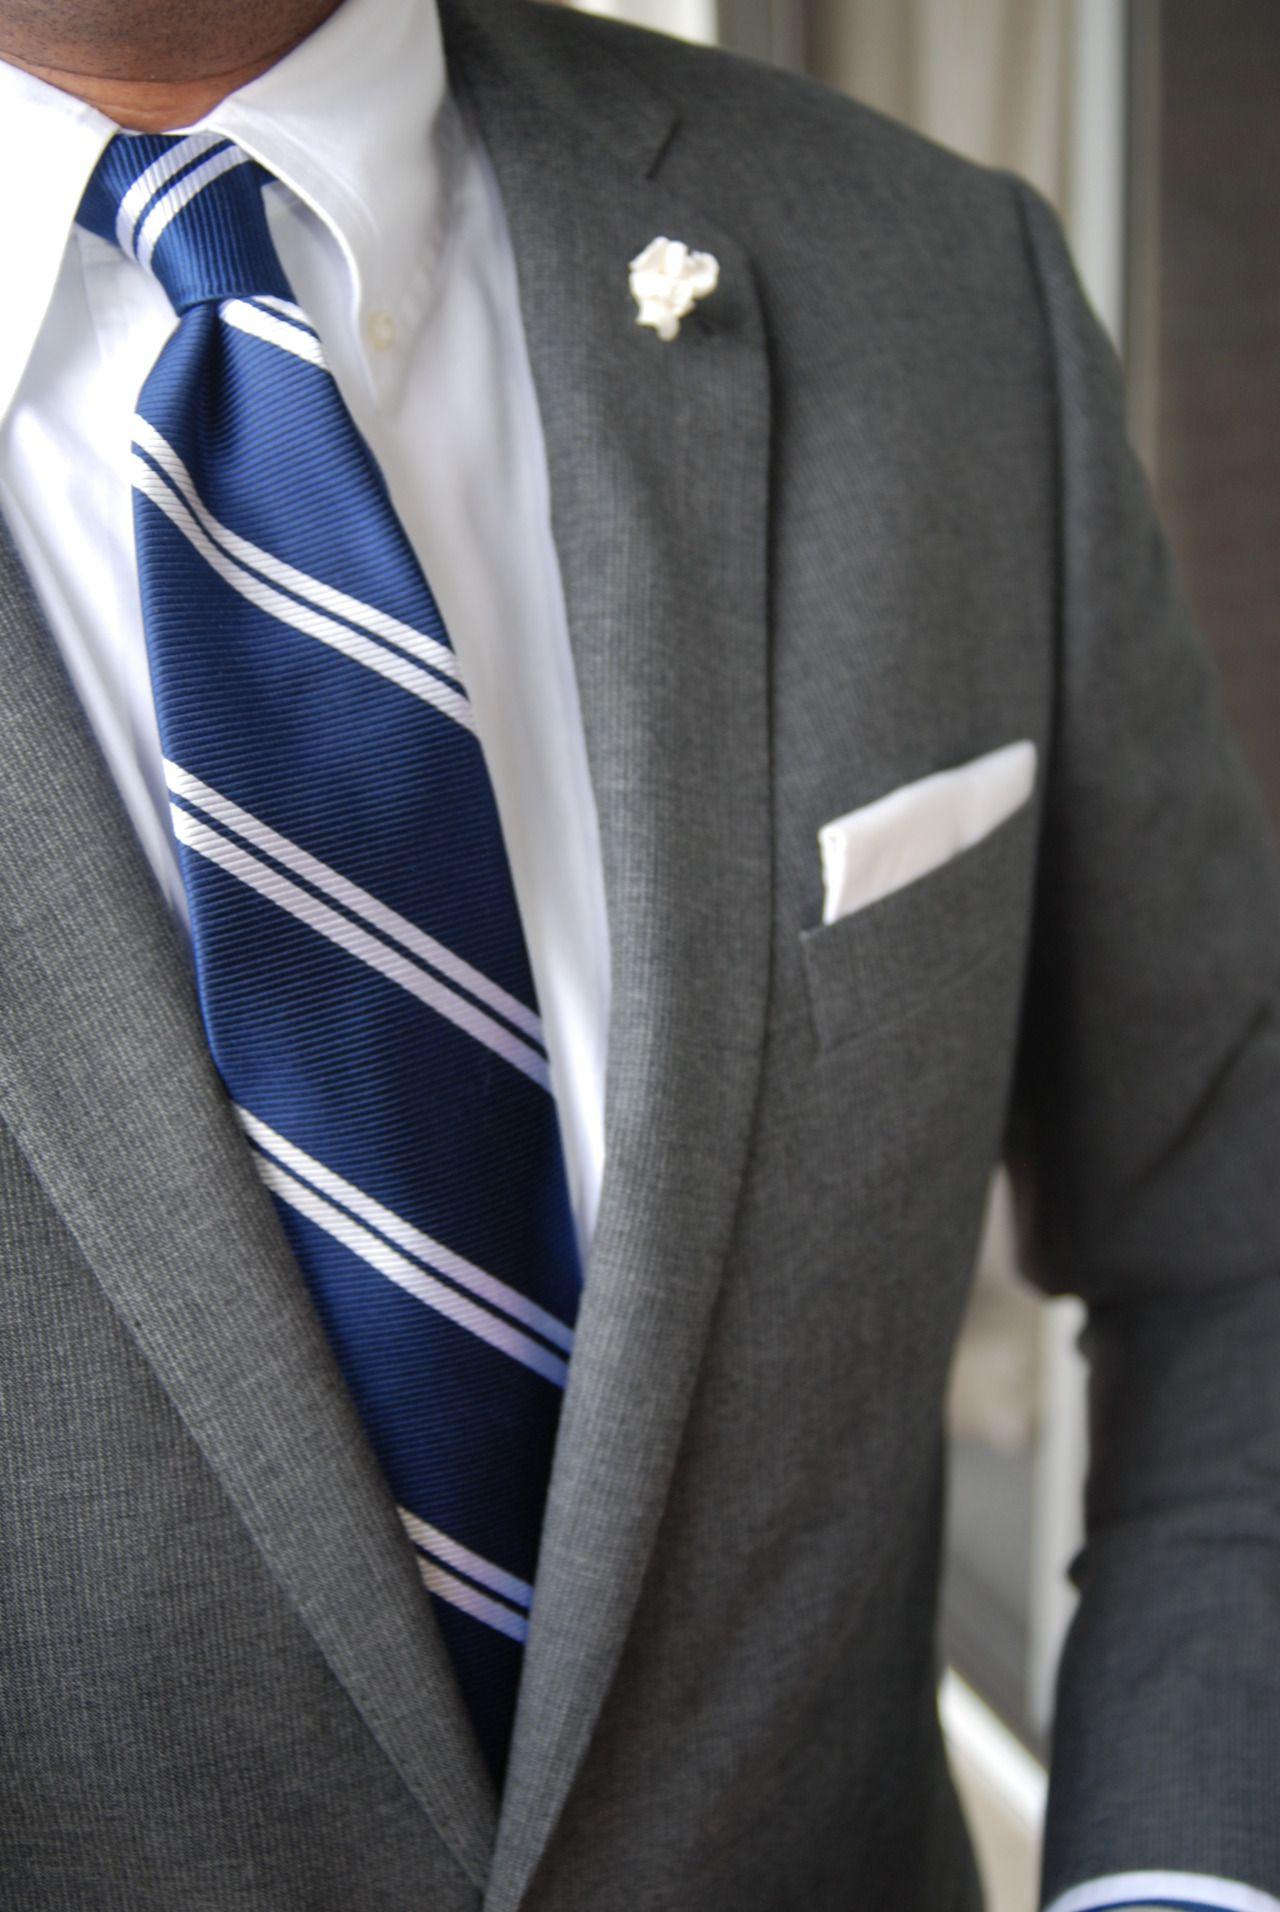 Mouchoir - Bleu Herringbones, Rayures Rouges Avec Encoche Bords Blancs